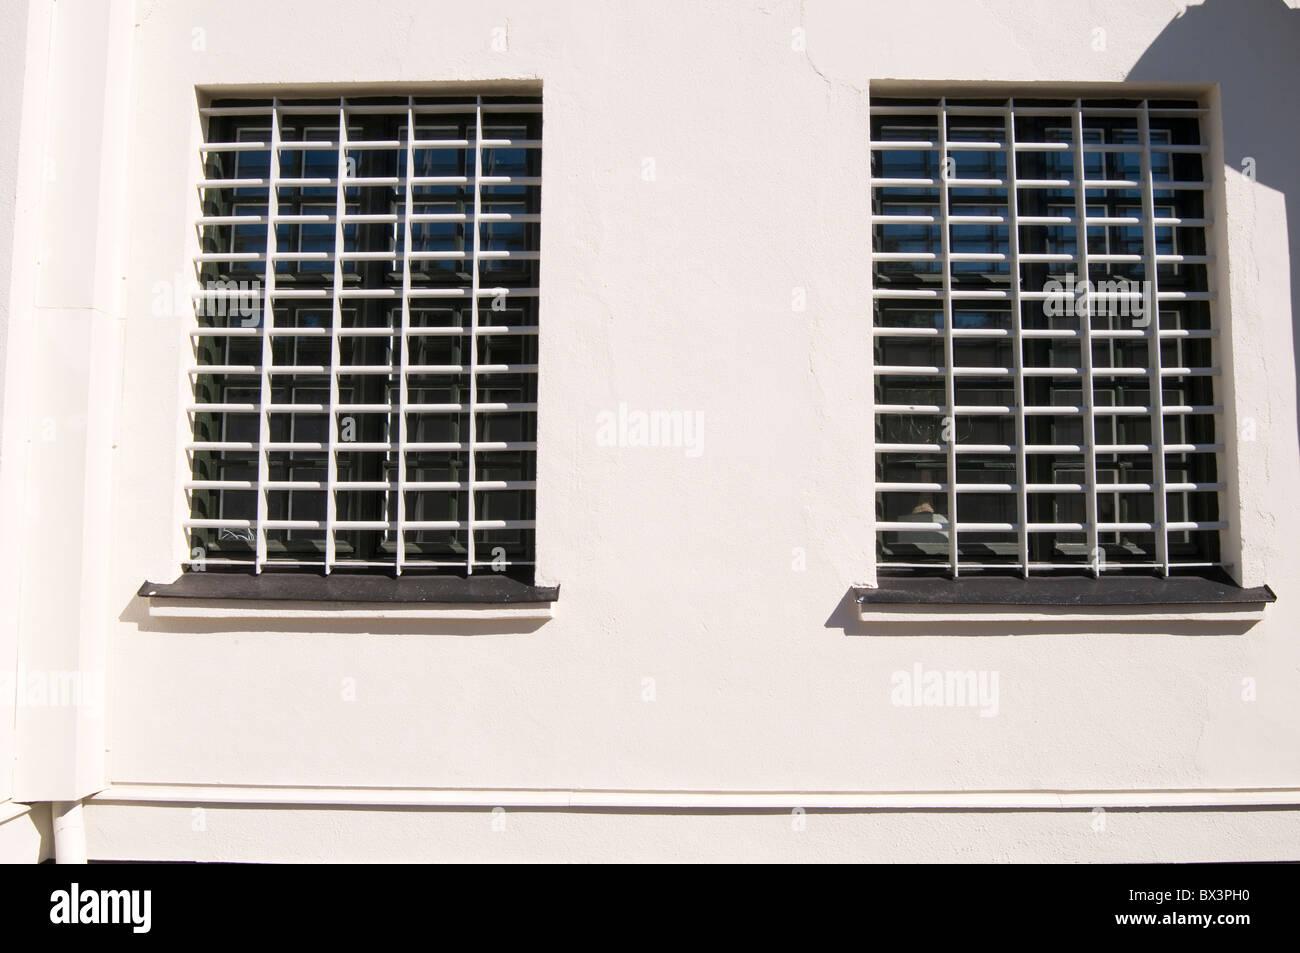 jail cell cells window bar bars on prison prisons  incarceration prisoner prisoners crime punishment law breaking - Stock Image